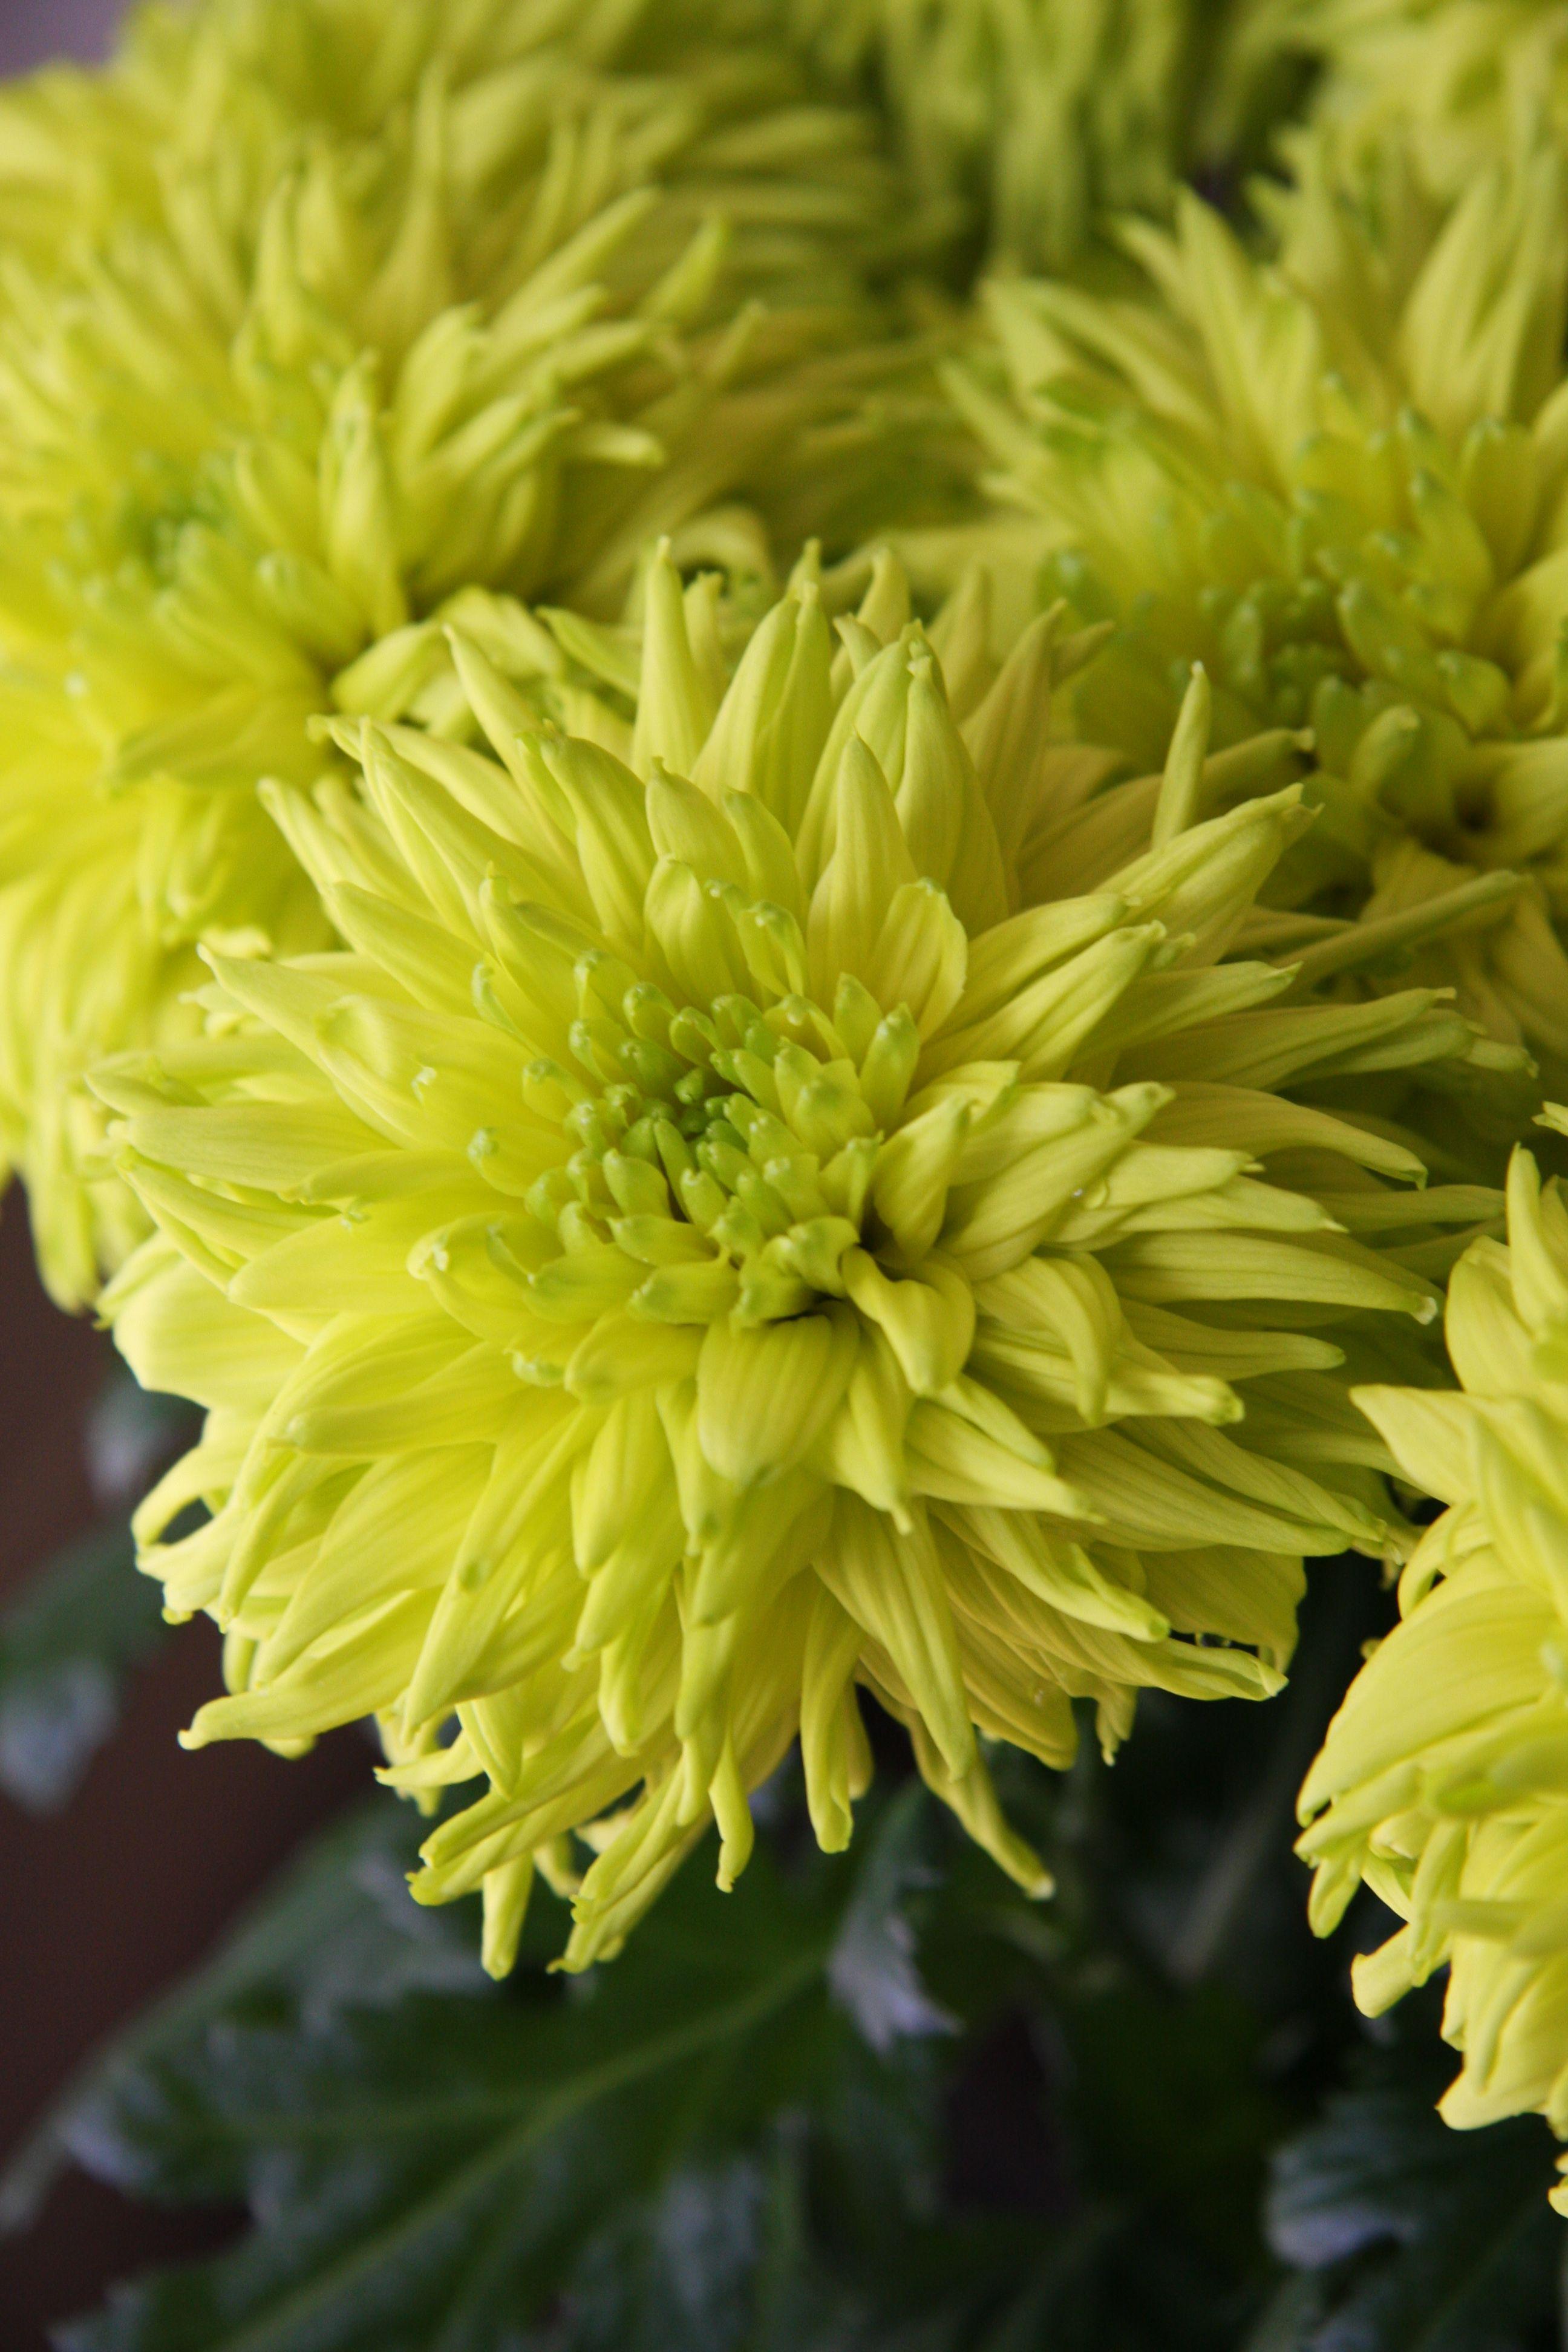 Chrysanthemum popeye chrysanthemum pinterest chrysanthemums